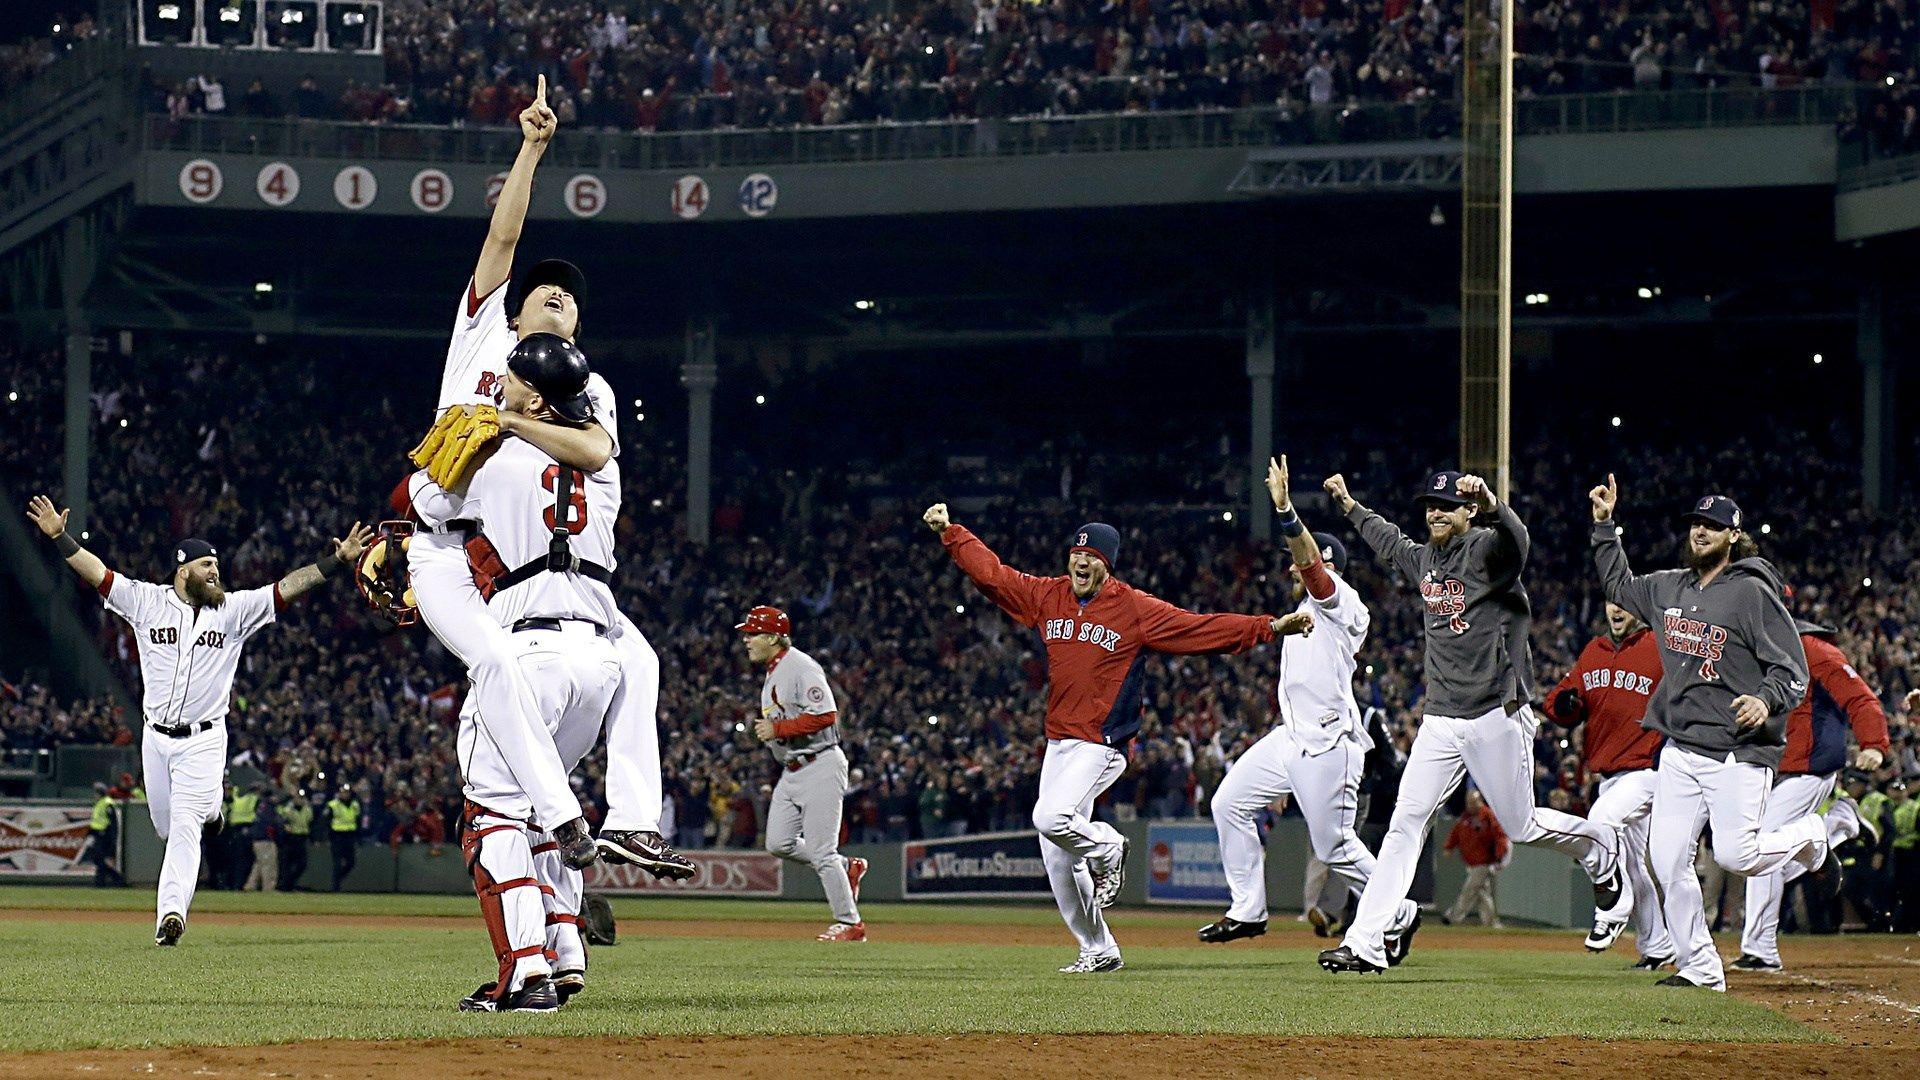 Boston Red Sox World Series Wallpapers Boston Red Sox Wallpaper Red Sox World Series Red Sox Wallpaper